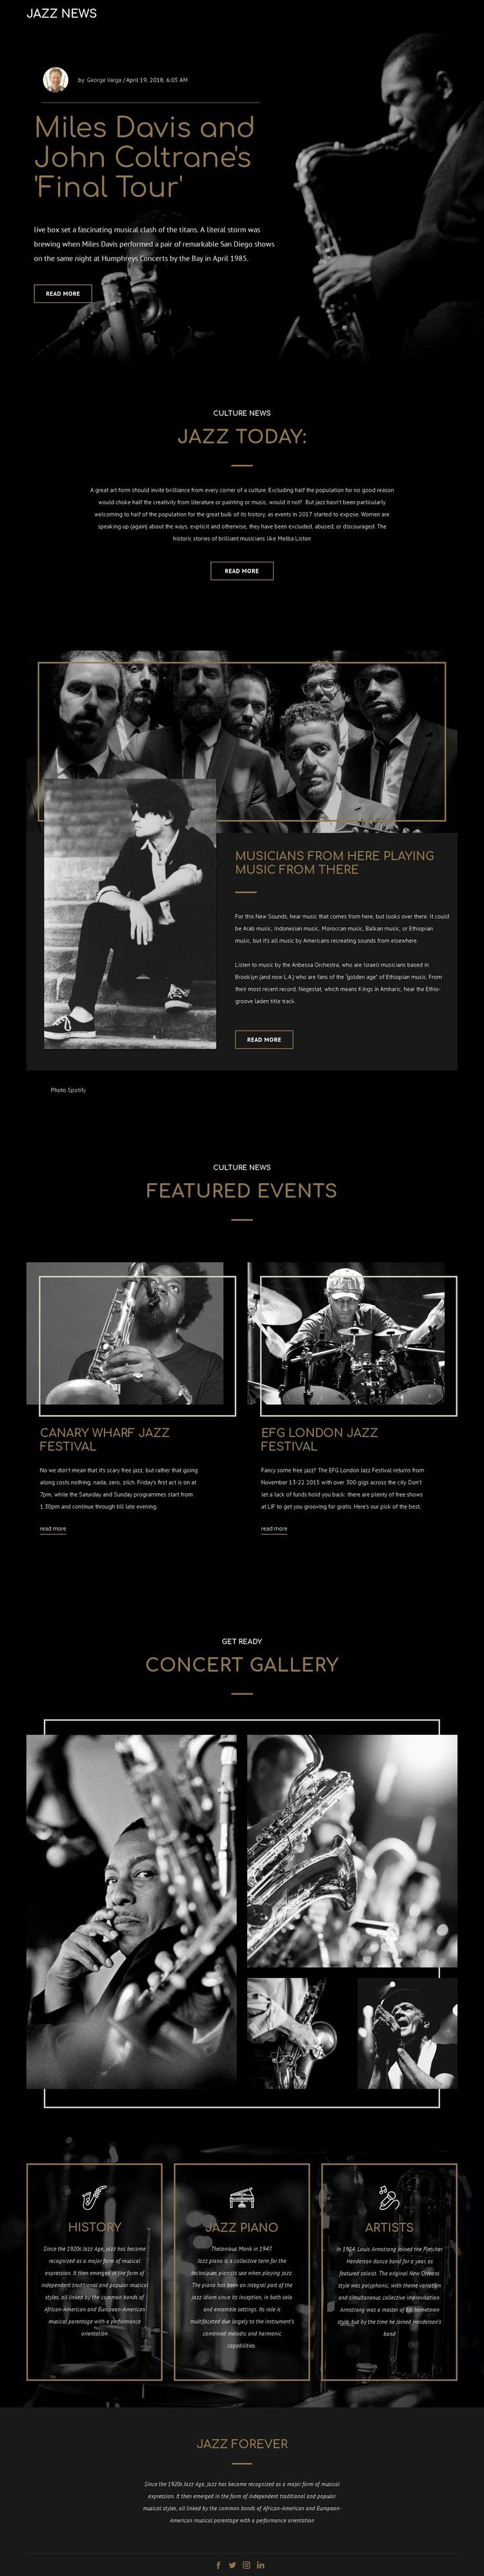 Legengs of jazz music Website Mockup